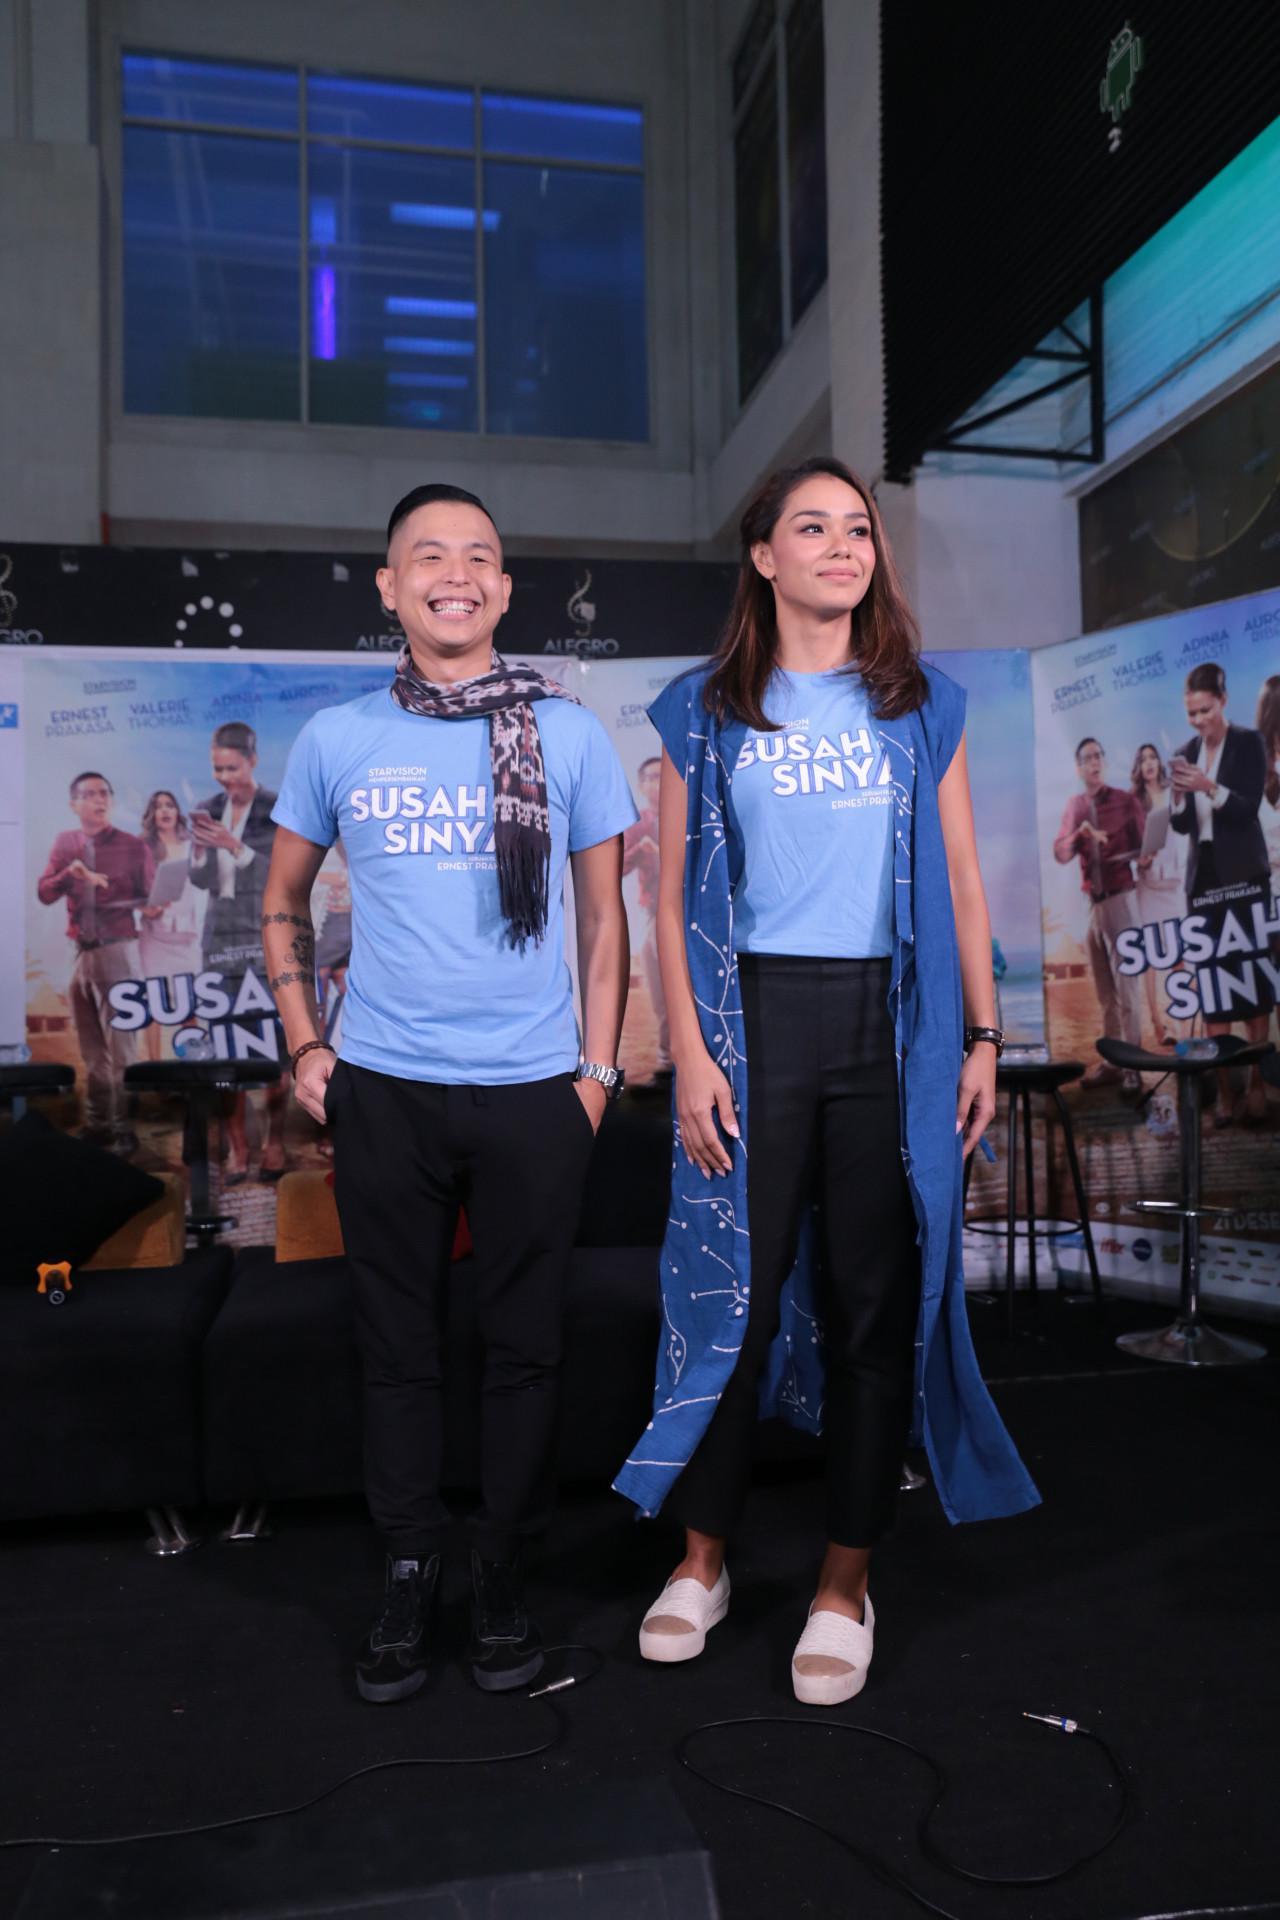 Untuk kedua kalinya Adinia Wirasti terlibat dalam film garapan Ernest Prakasa. Kini, pemeran kelahiran Jakarta 30 tahun itu bermain dalam drama komedi. (Adrian Putra/Bintang.com)